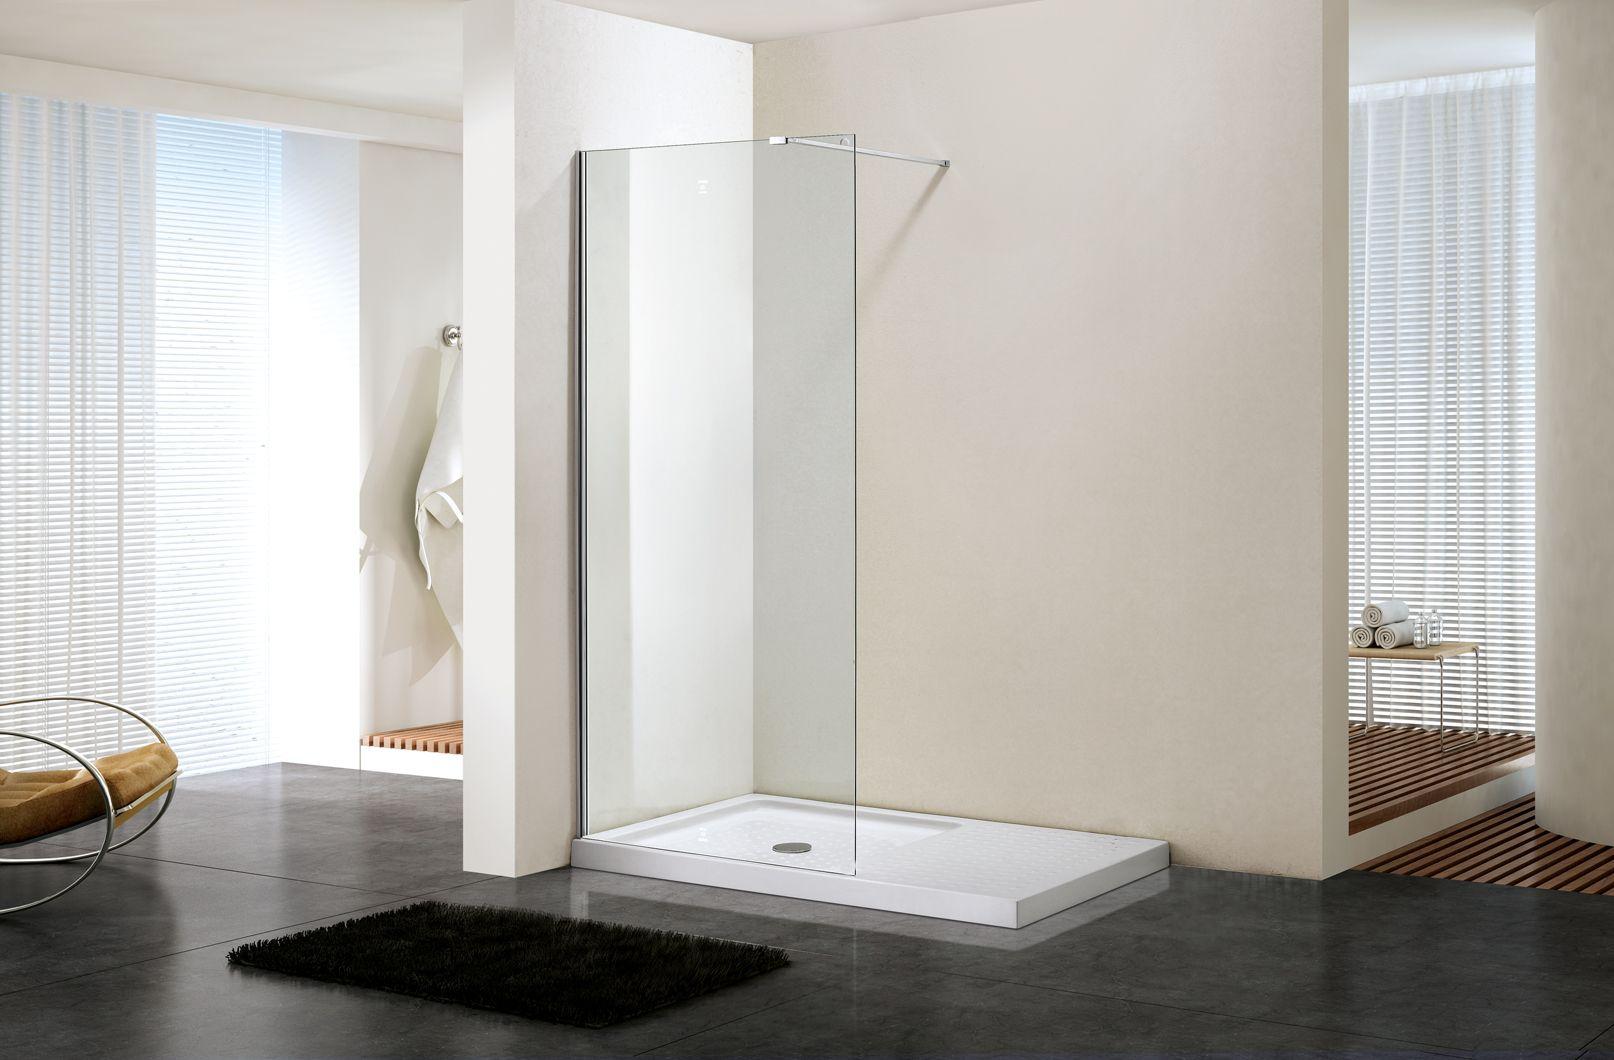 We Provide Reasonable Beautiful And Wholesale Shower Enclosures Cubicles Shower Doors Online And In Store At Diy Shower Door Shower Doors Shower Enclosure